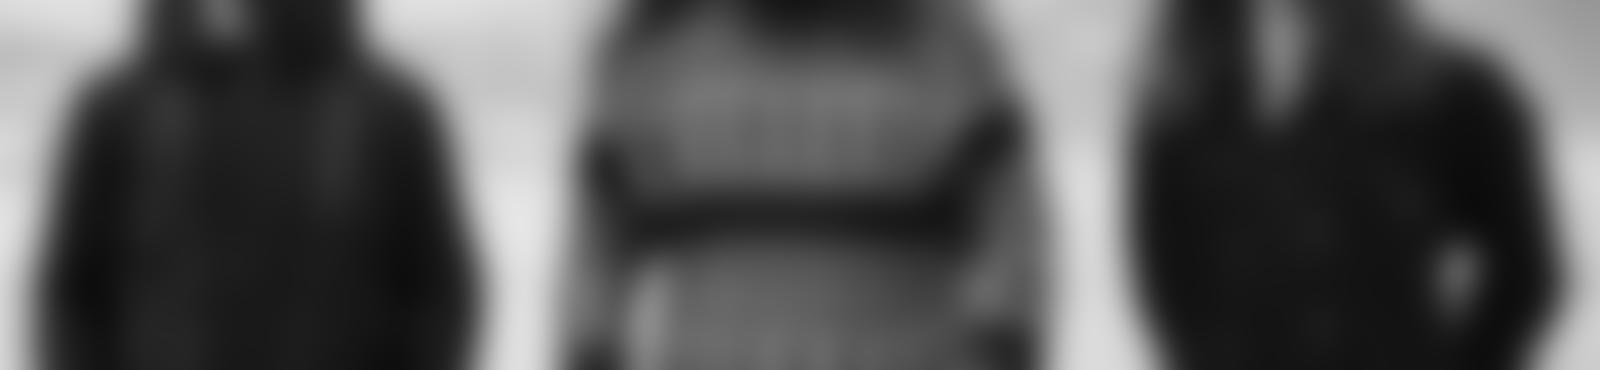 Blurred 08e9b956 ba77 4ac6 93eb eafa24da19a1